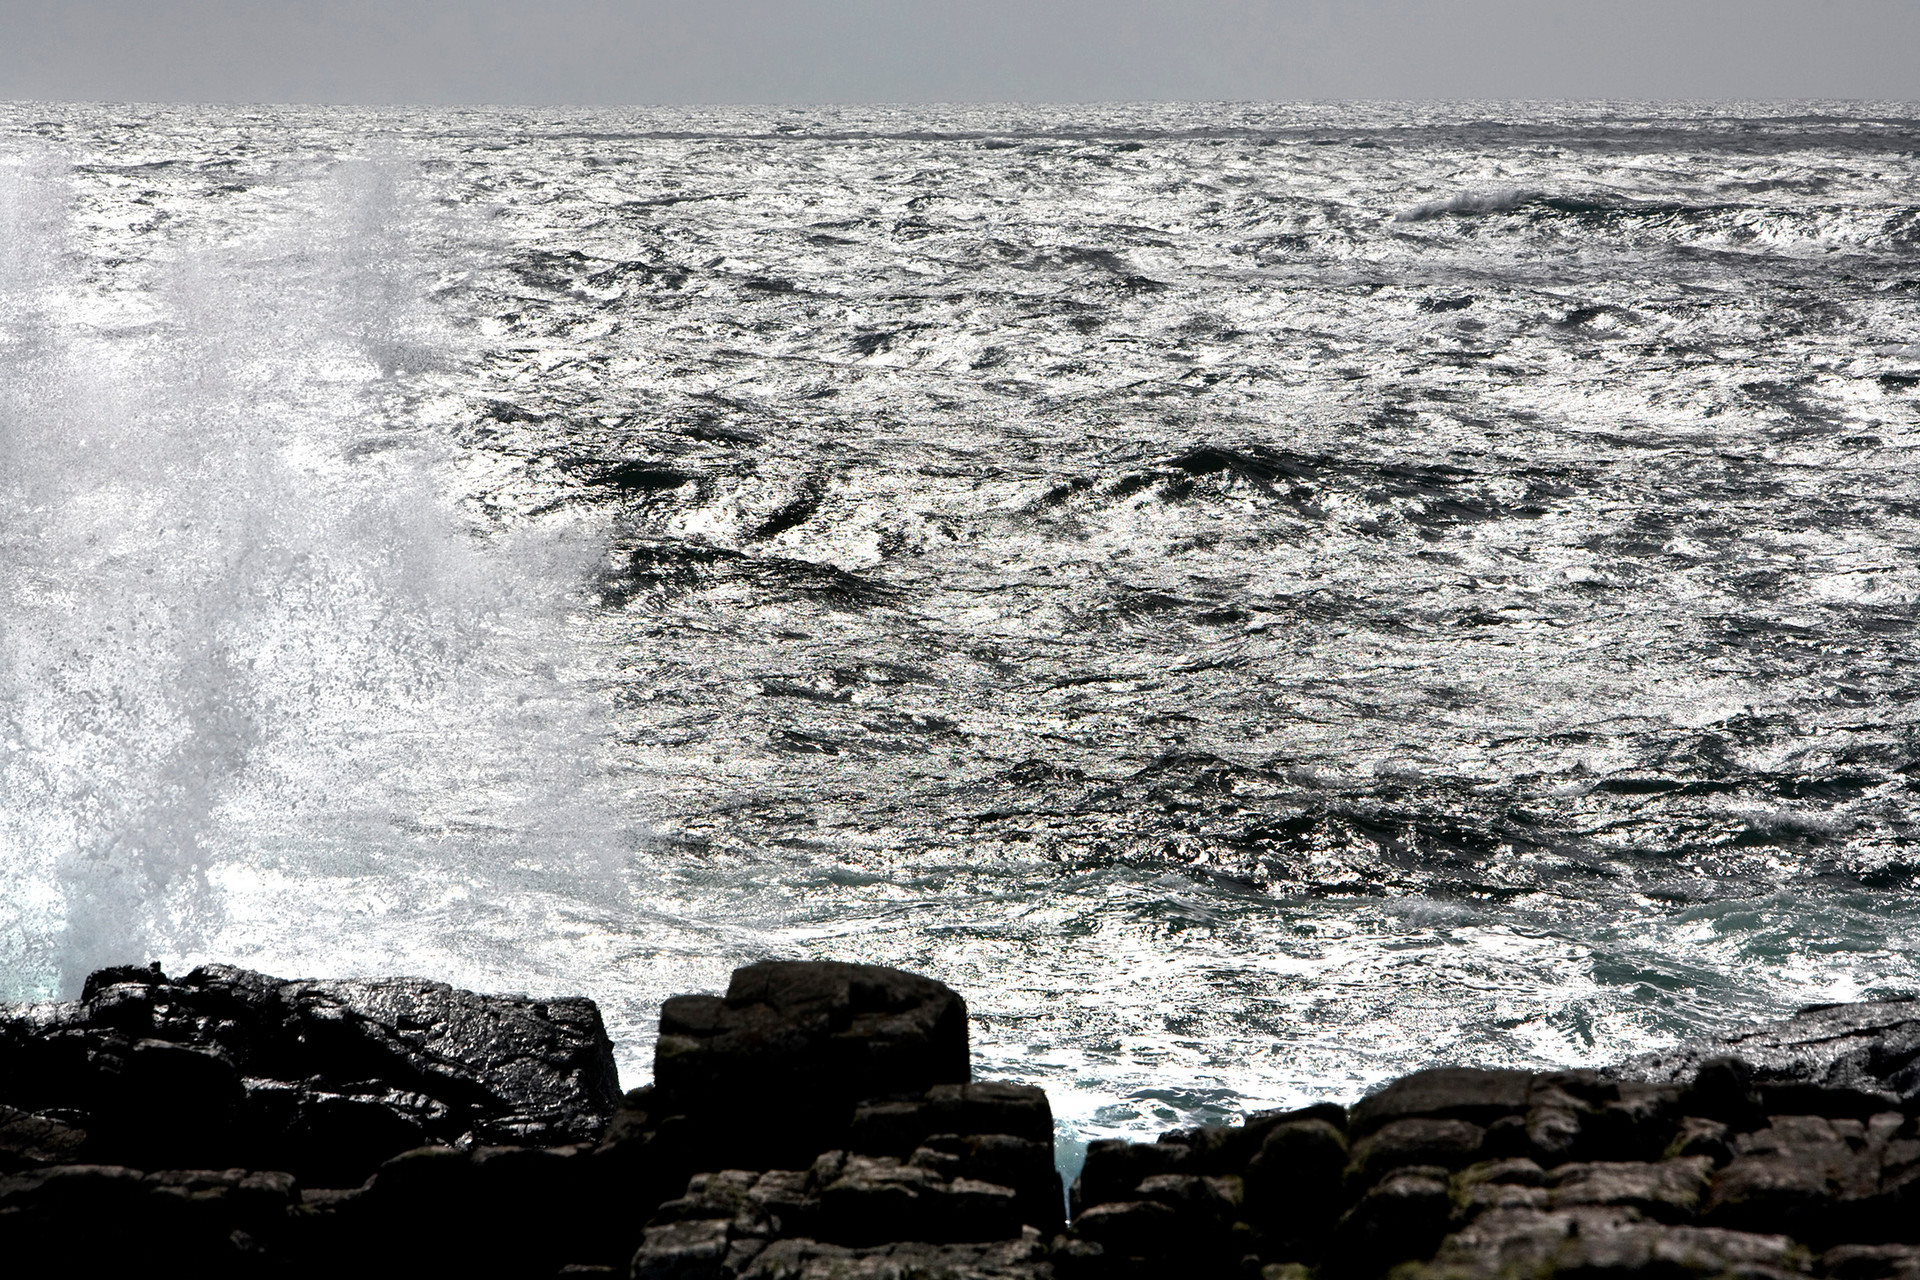 Waves crashing, Neist Point